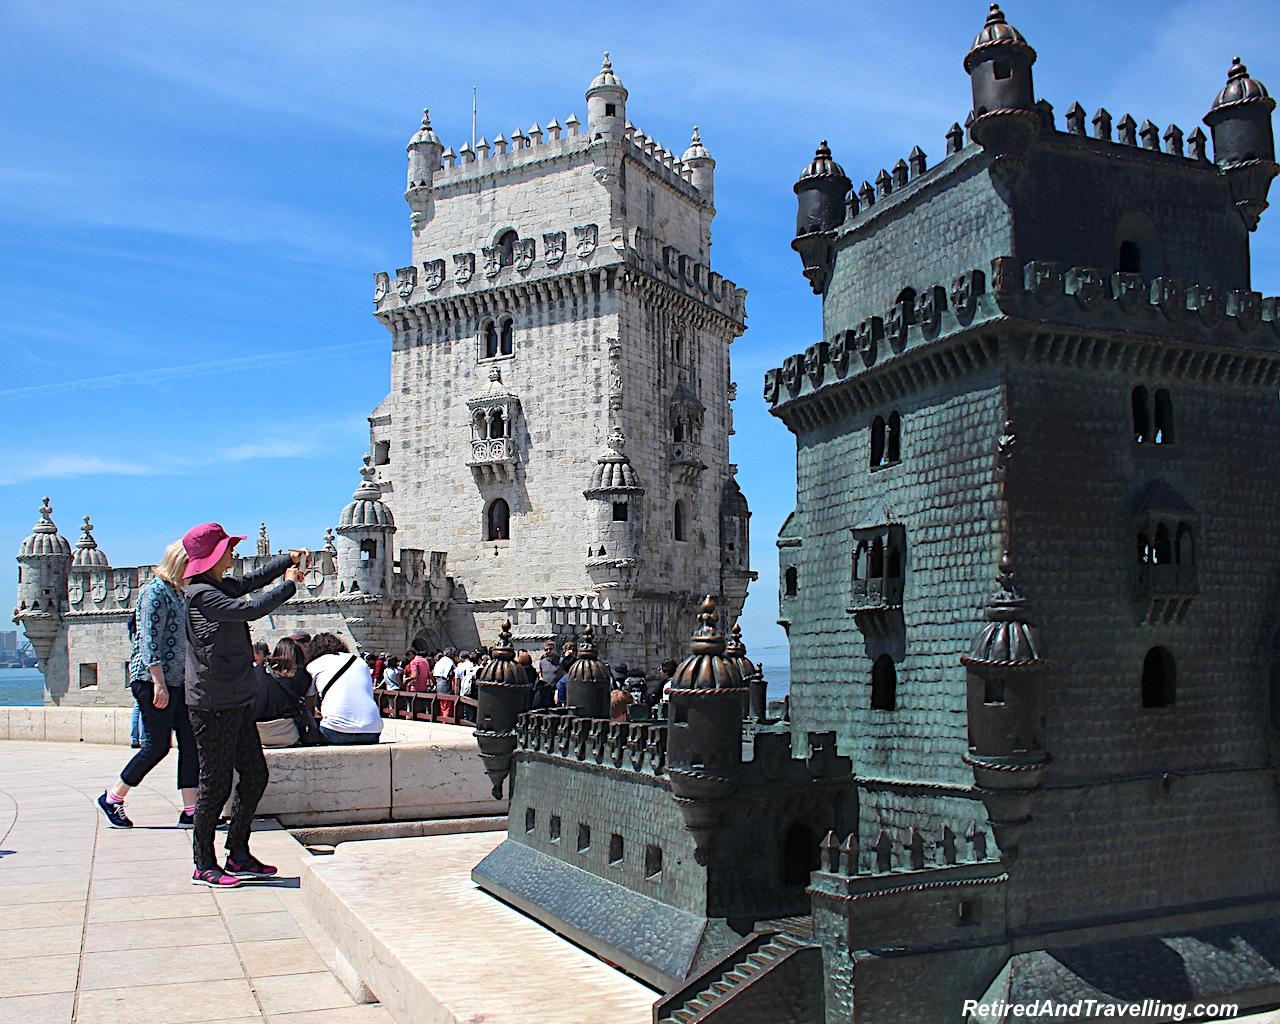 Belem Tower Model - Explore The Belem Area In Lisbon.jpg